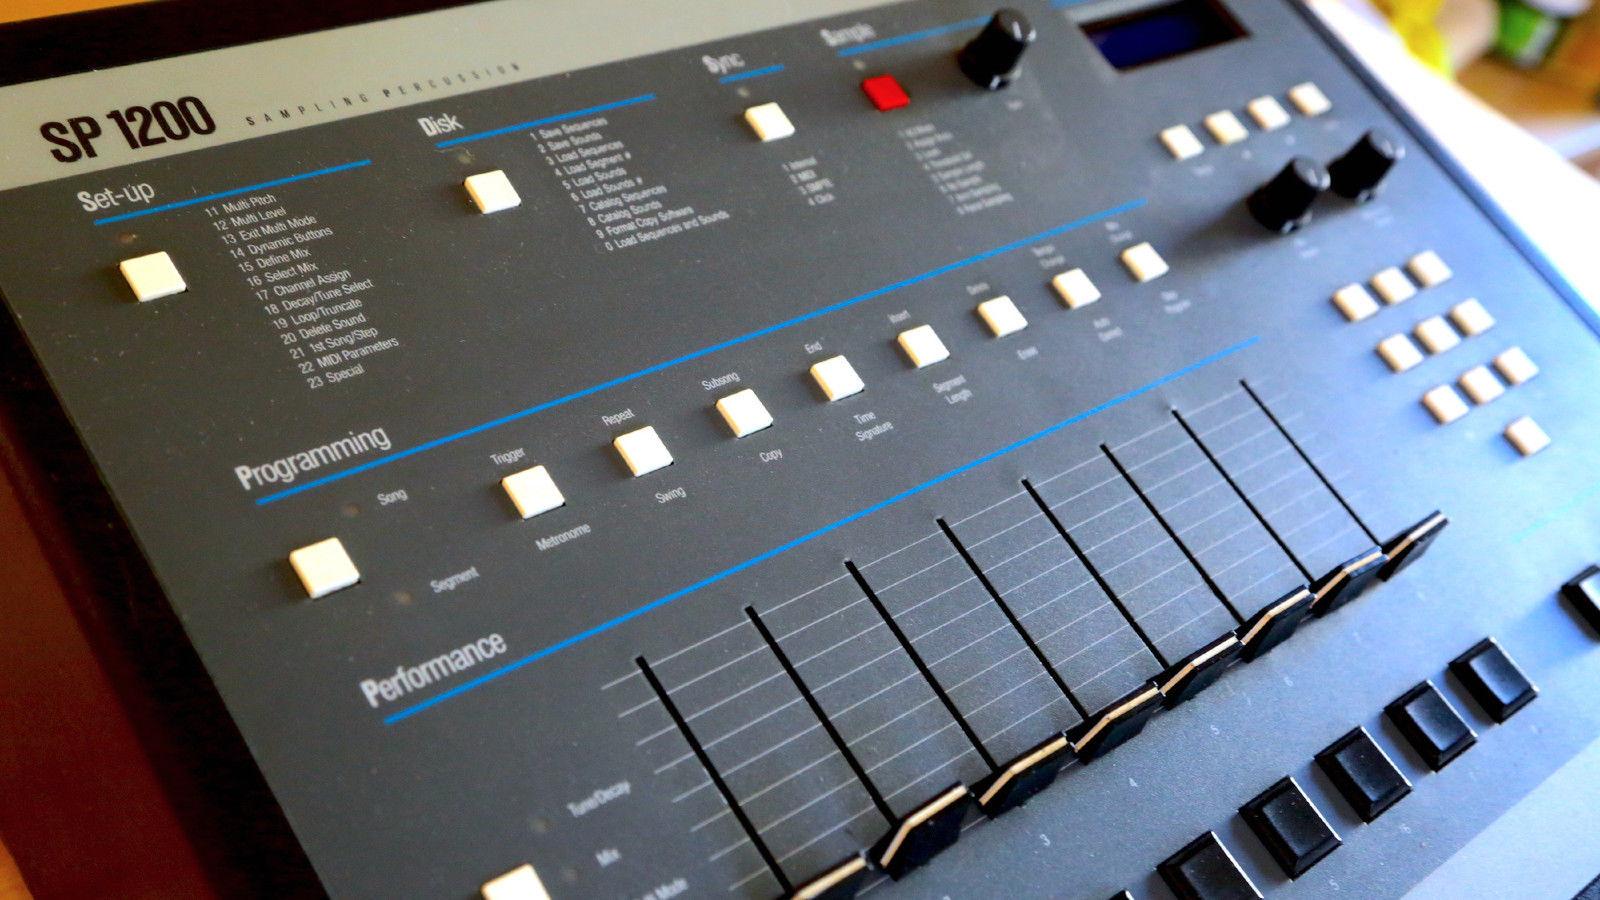 matrixsynth emu sp1200 vintage sampling drum machine with new blue screen. Black Bedroom Furniture Sets. Home Design Ideas